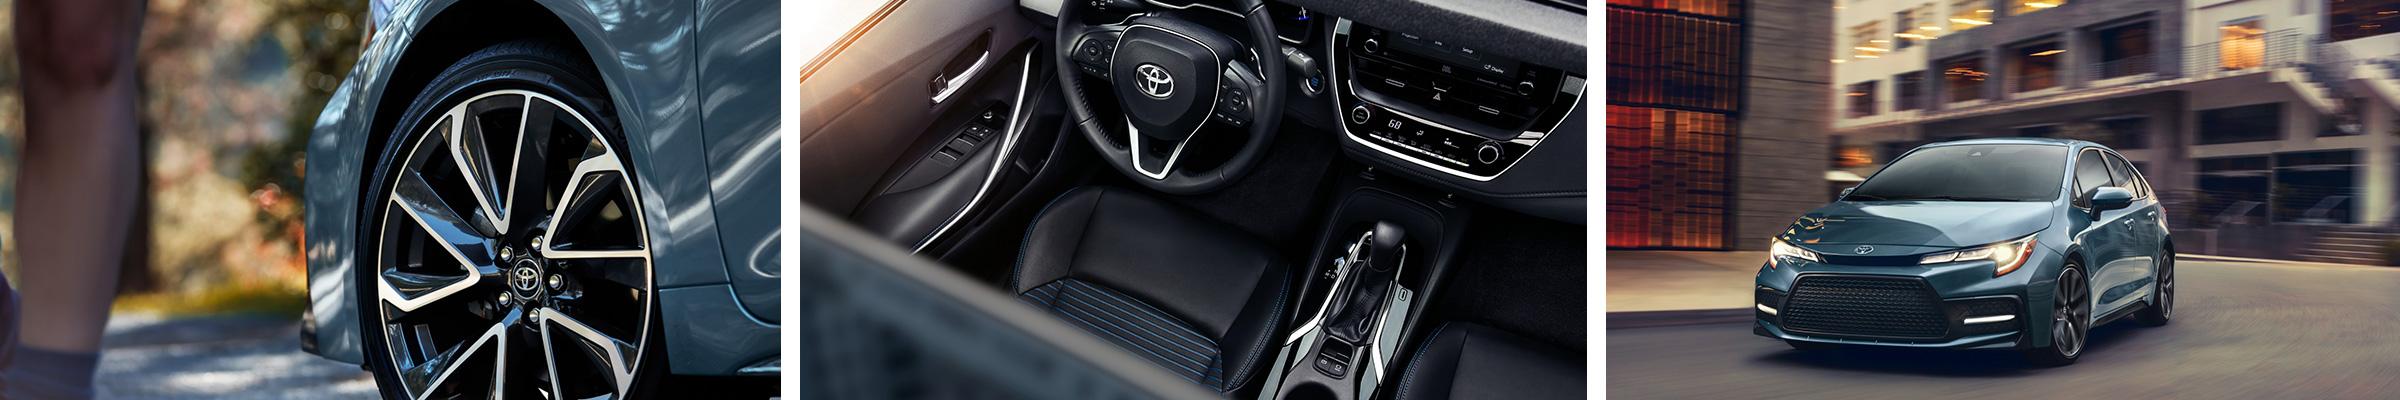 2021 Toyota Corolla For Sale Milwaukee WI | Oak Creek